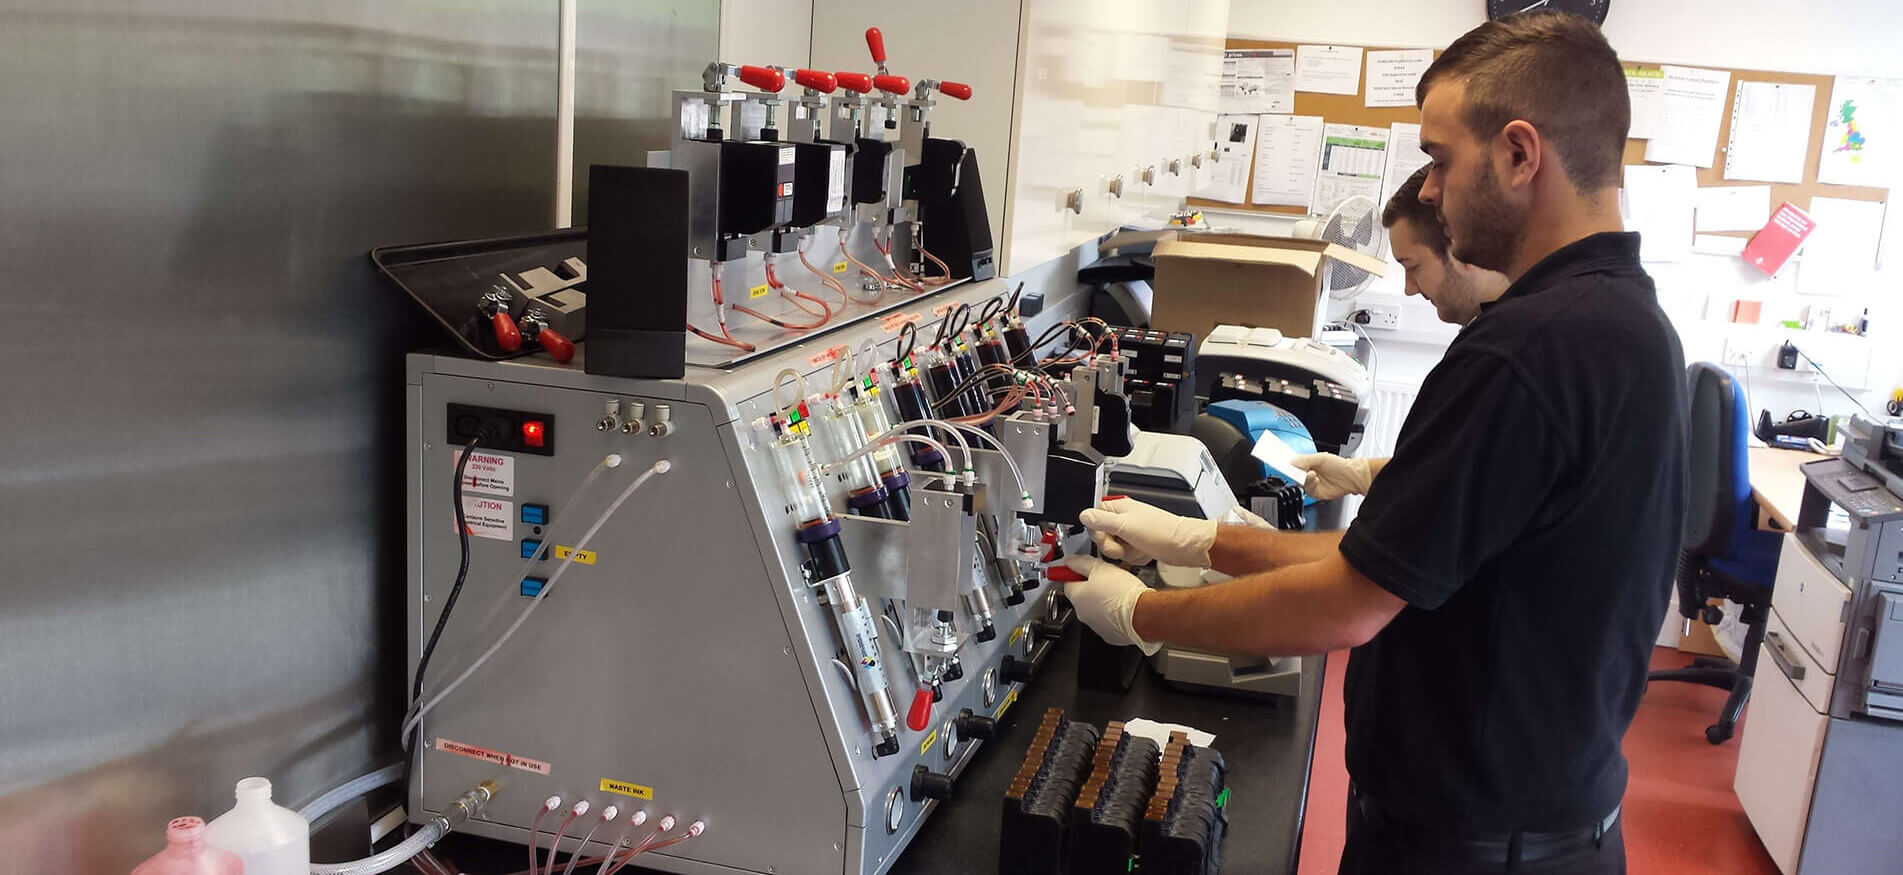 Refilling Machine Image 1